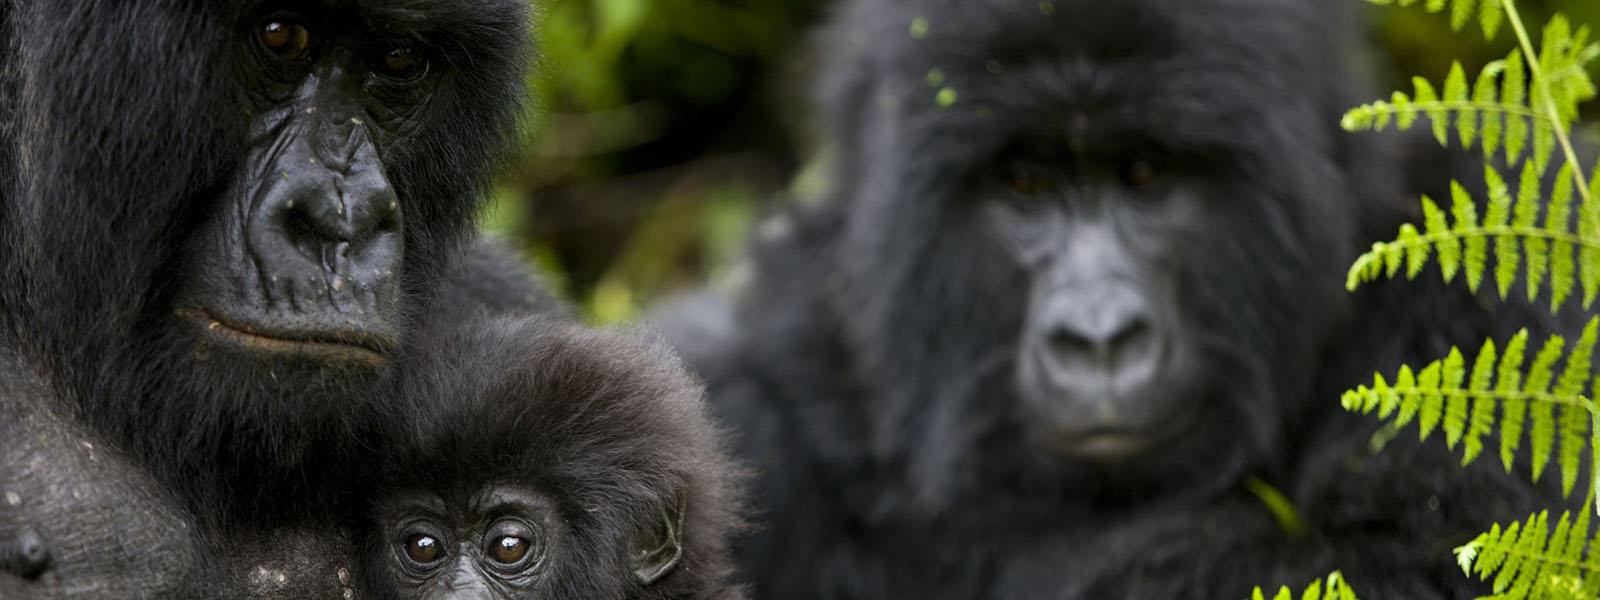 Our Gorilla Trekking Company